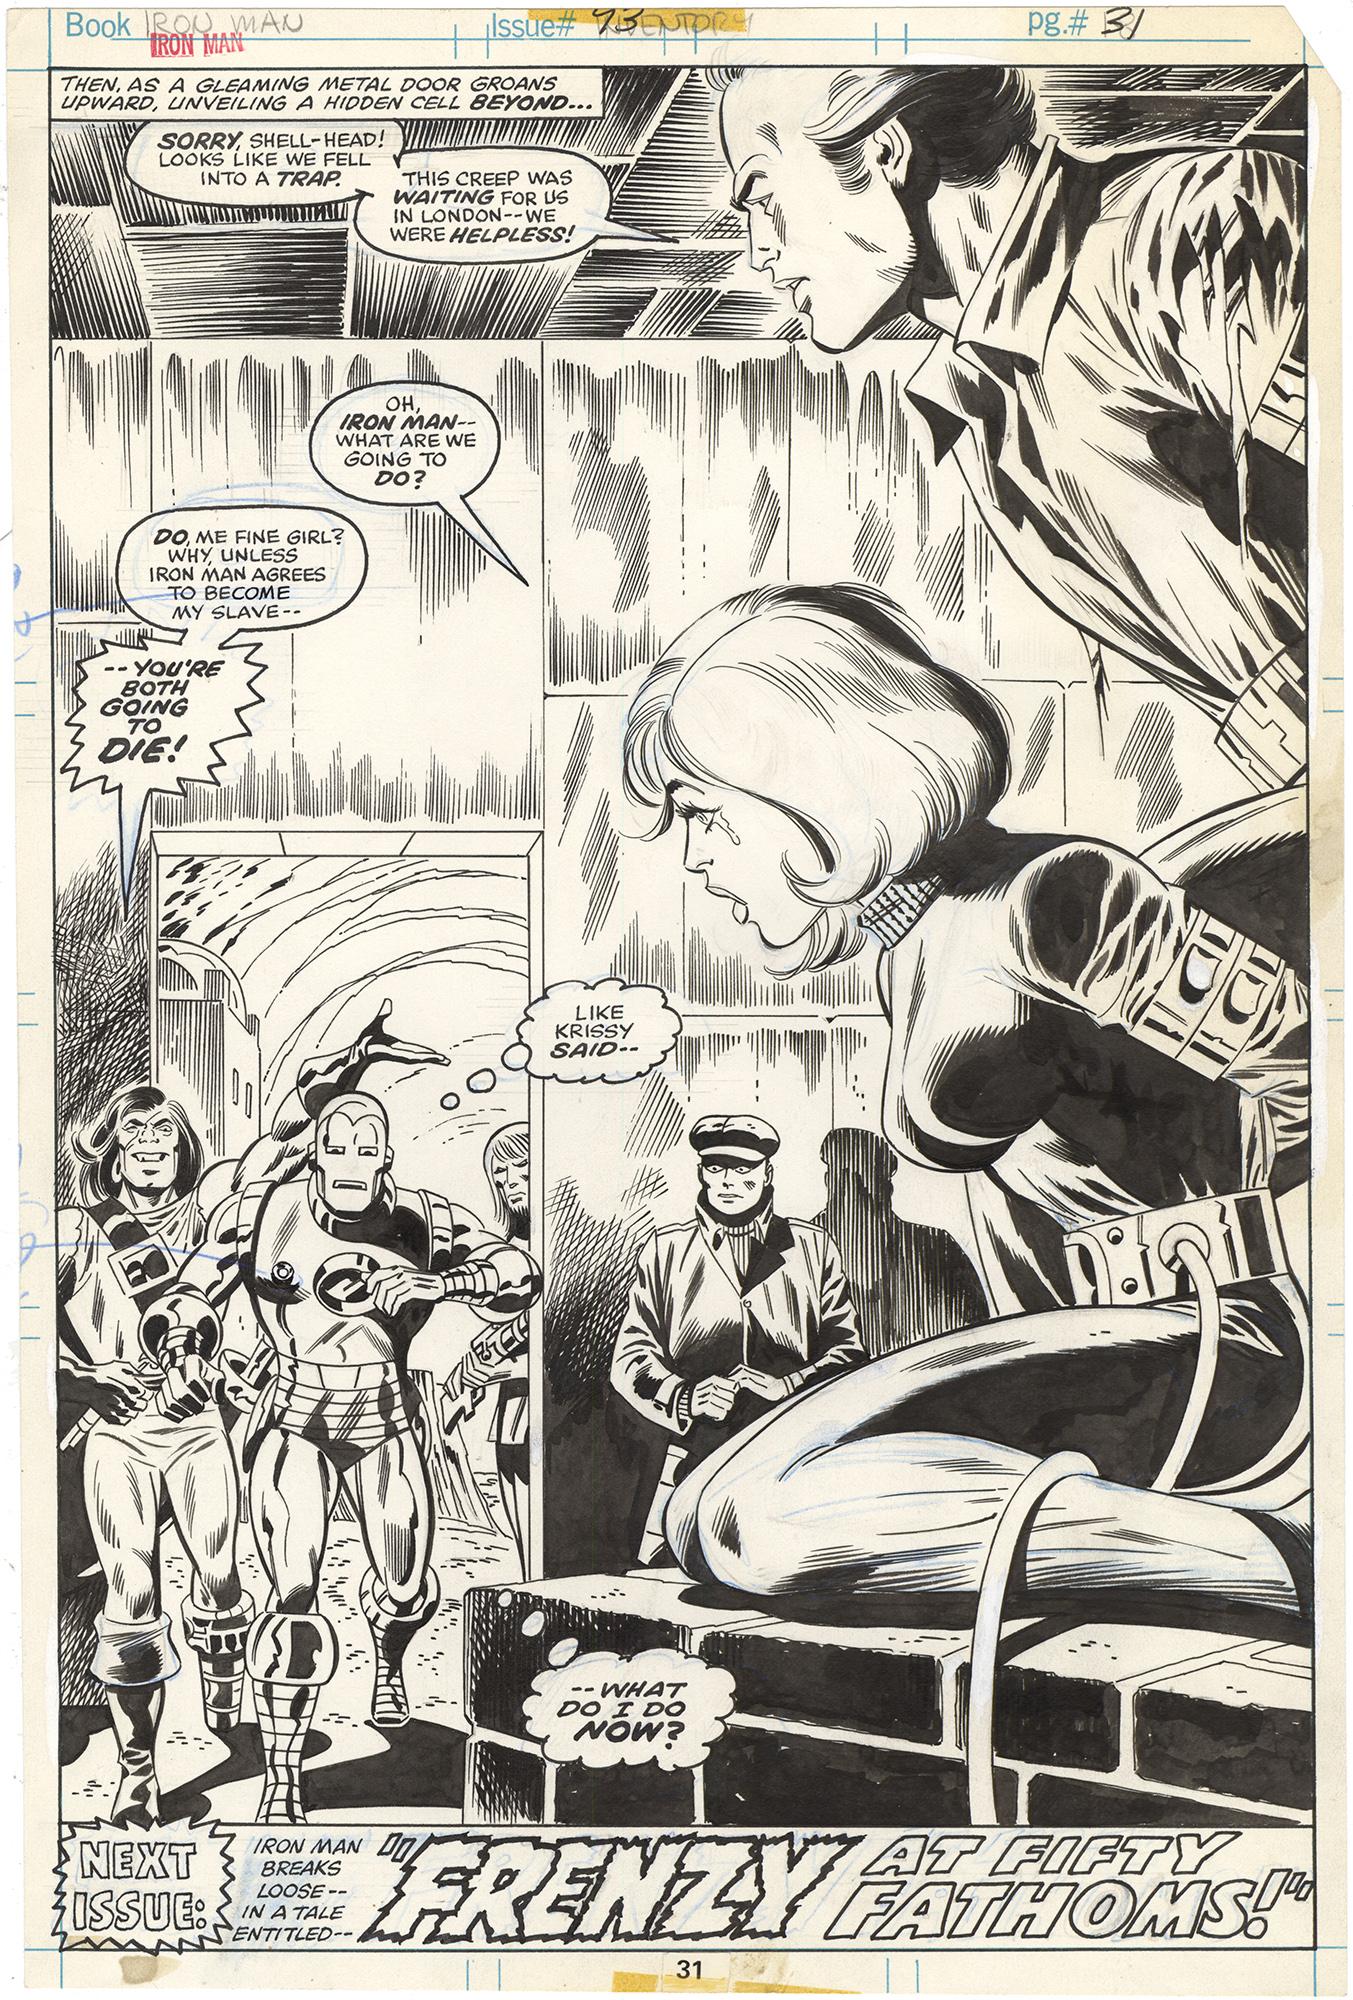 Iron Man #93 p31